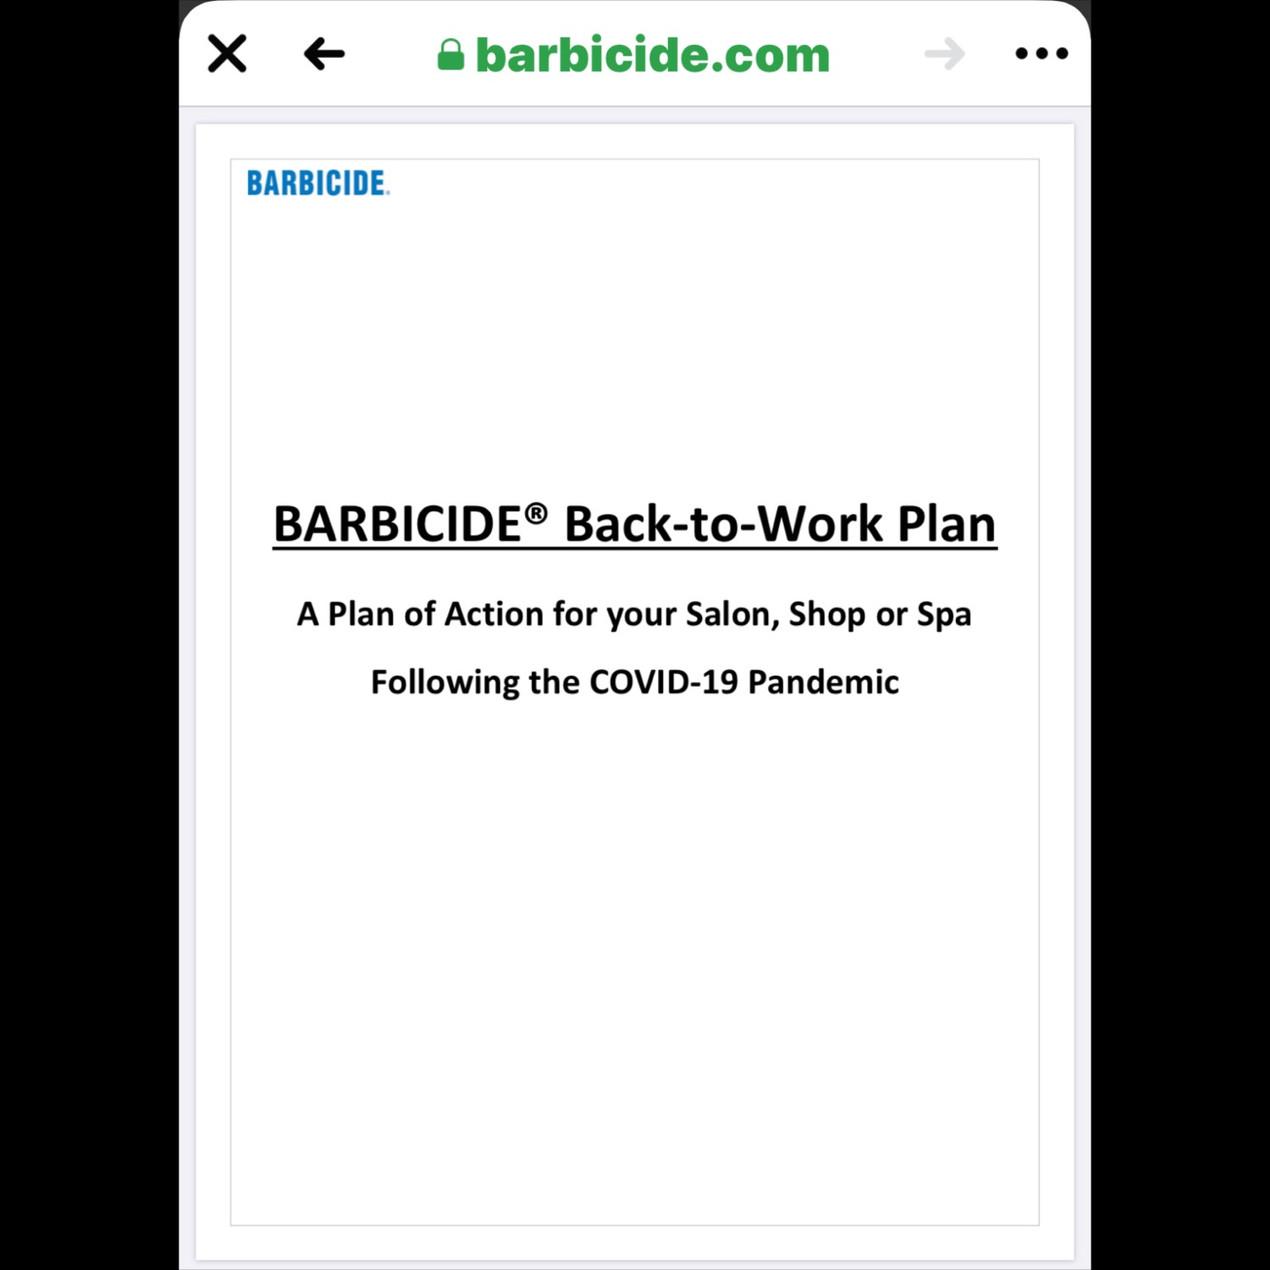 Barbicide Back-To-Work Plan